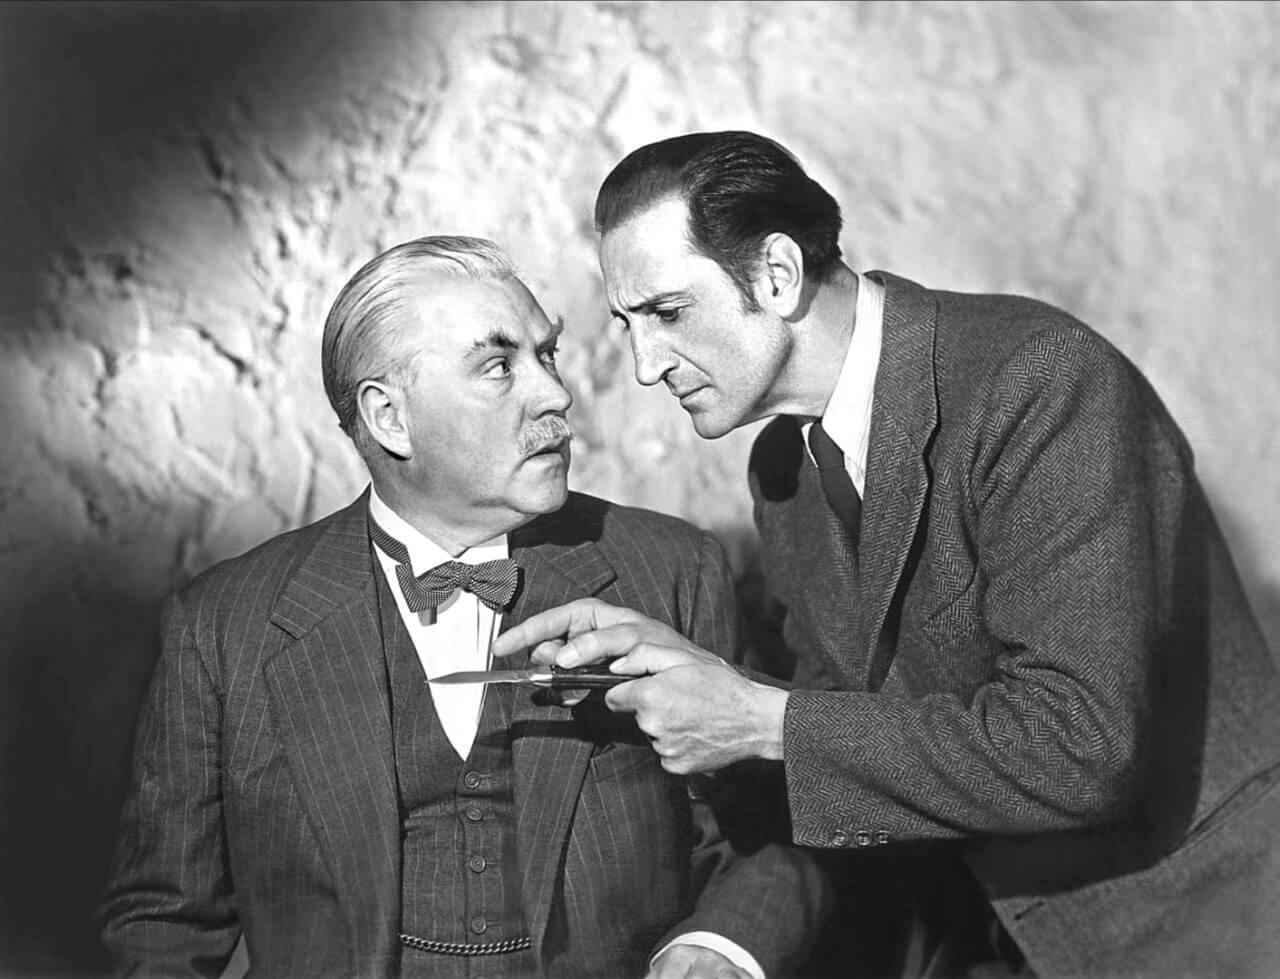 FRASES | As melhores frases de Sherlock Holmes